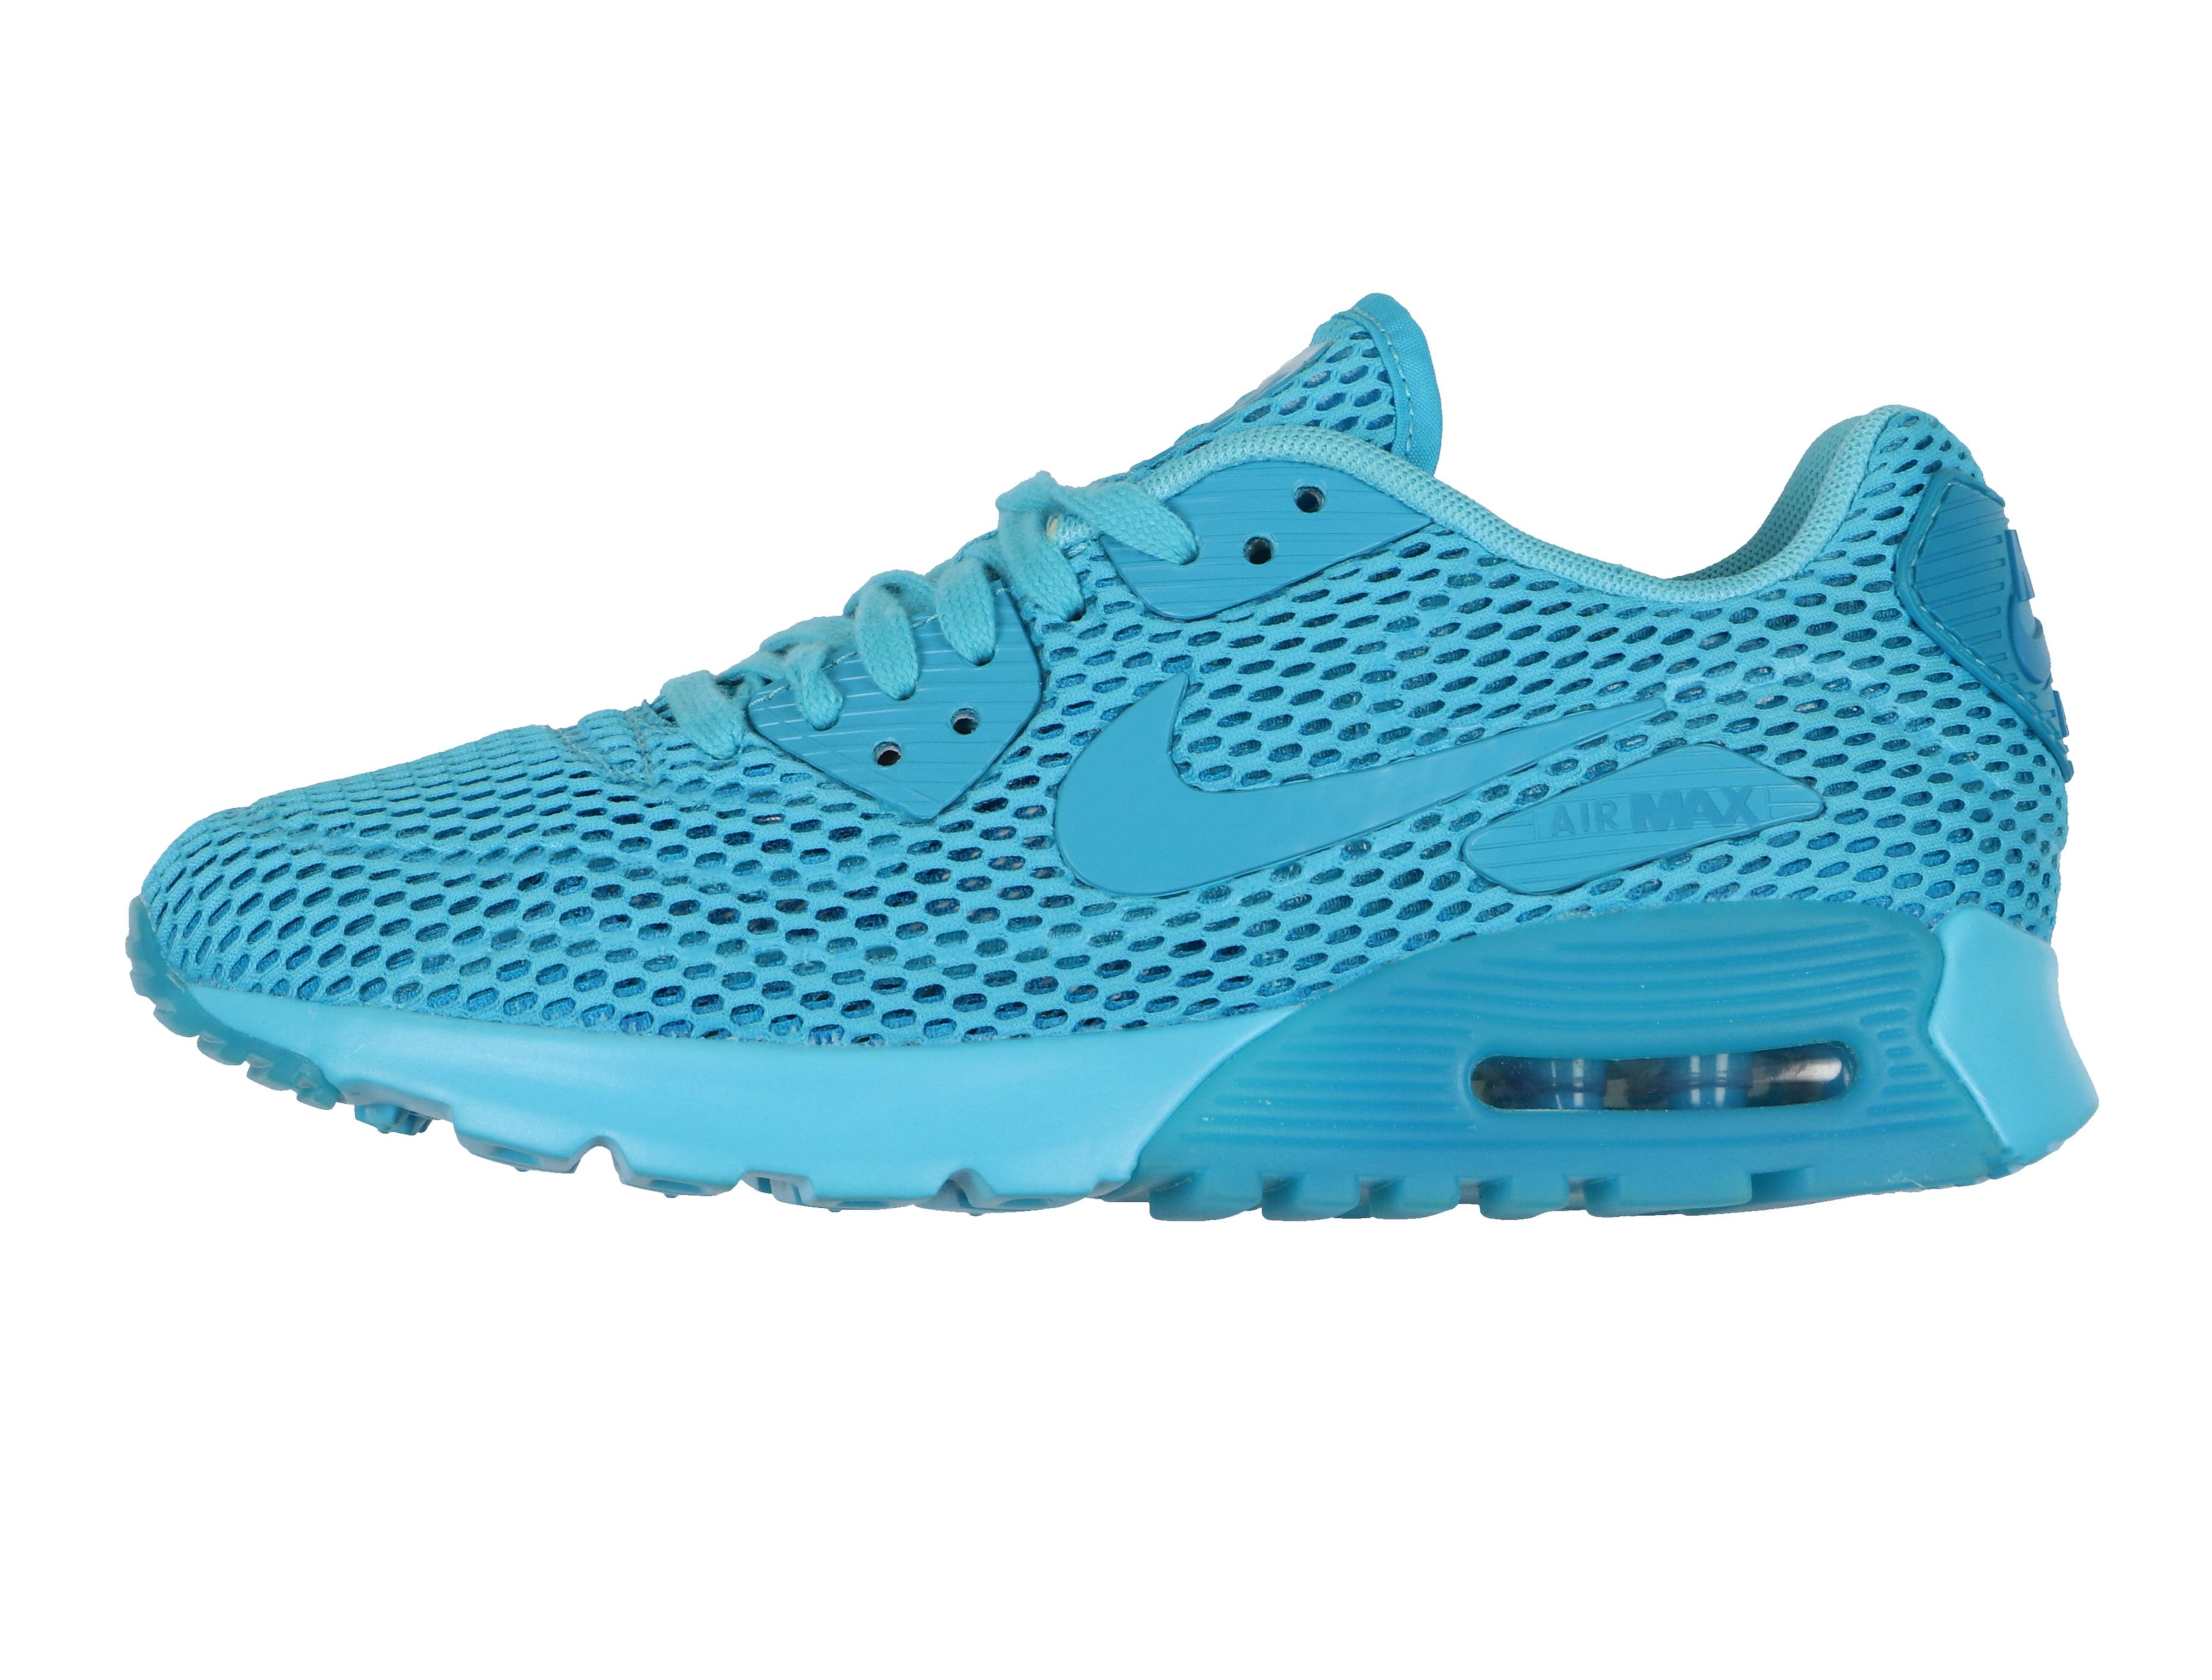 26d906eb68d92 low price nike flyknit max ebacf 57f21  denmark nike nike womens air max 90  ultra br running shoes gamma blue blue lagoon walmart